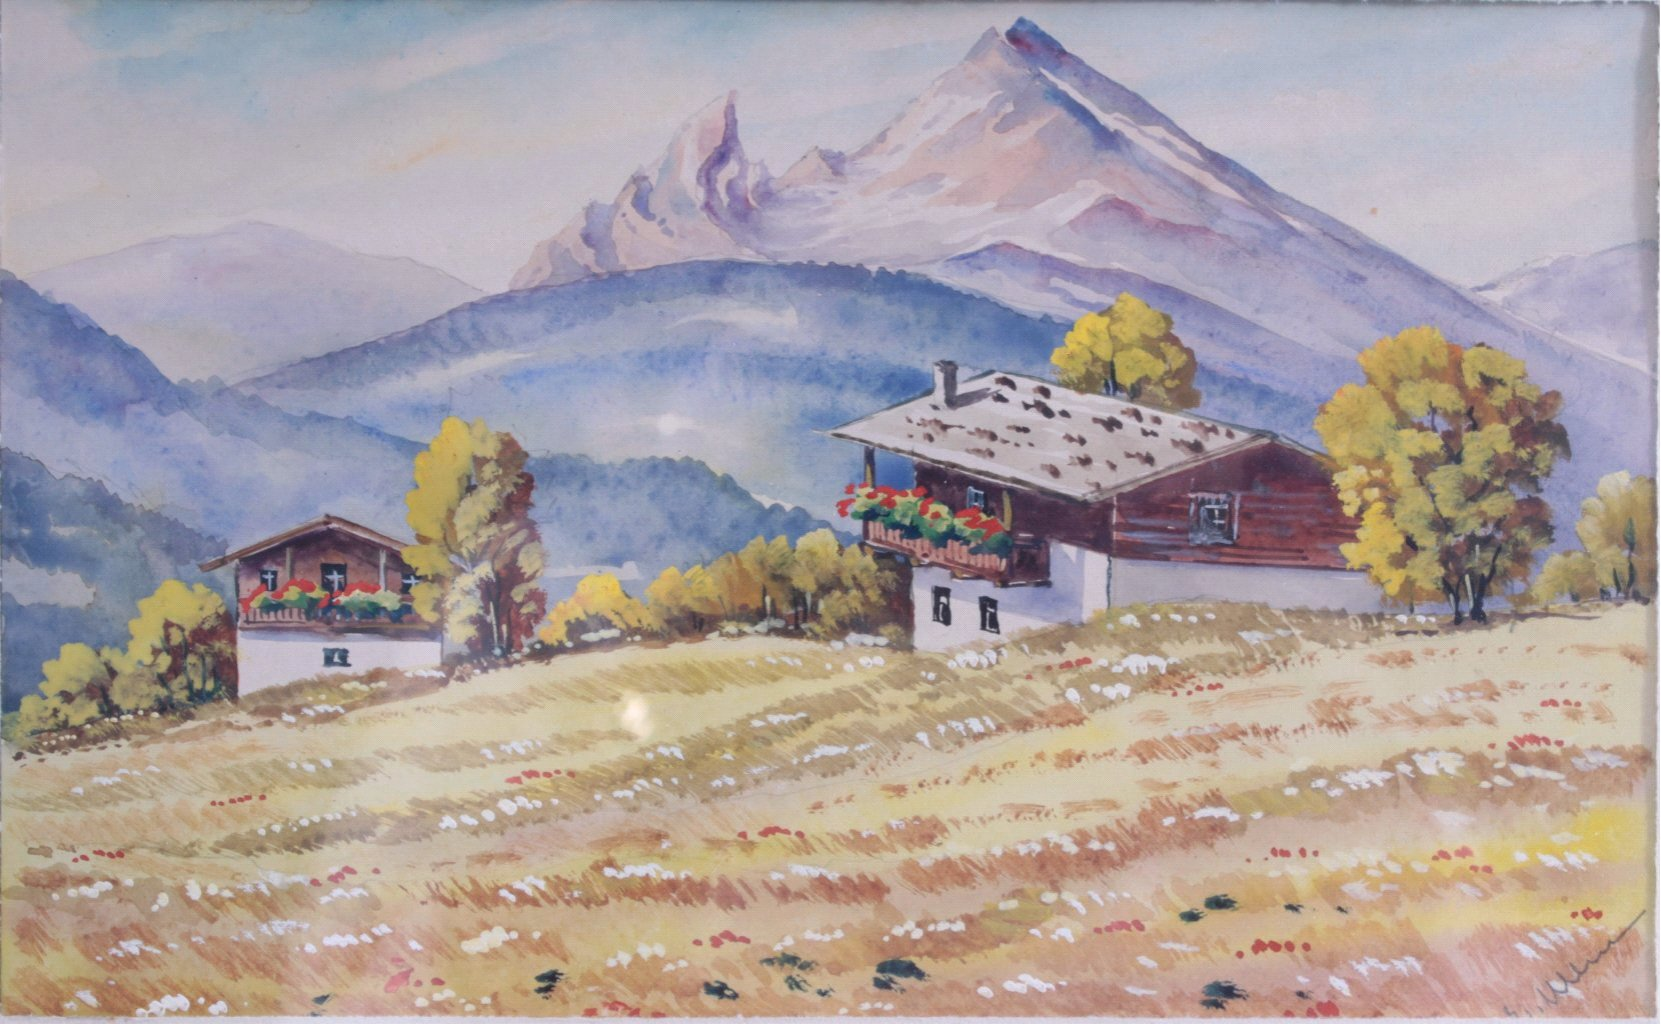 Aquarell, Berglandschaft mit Häuser